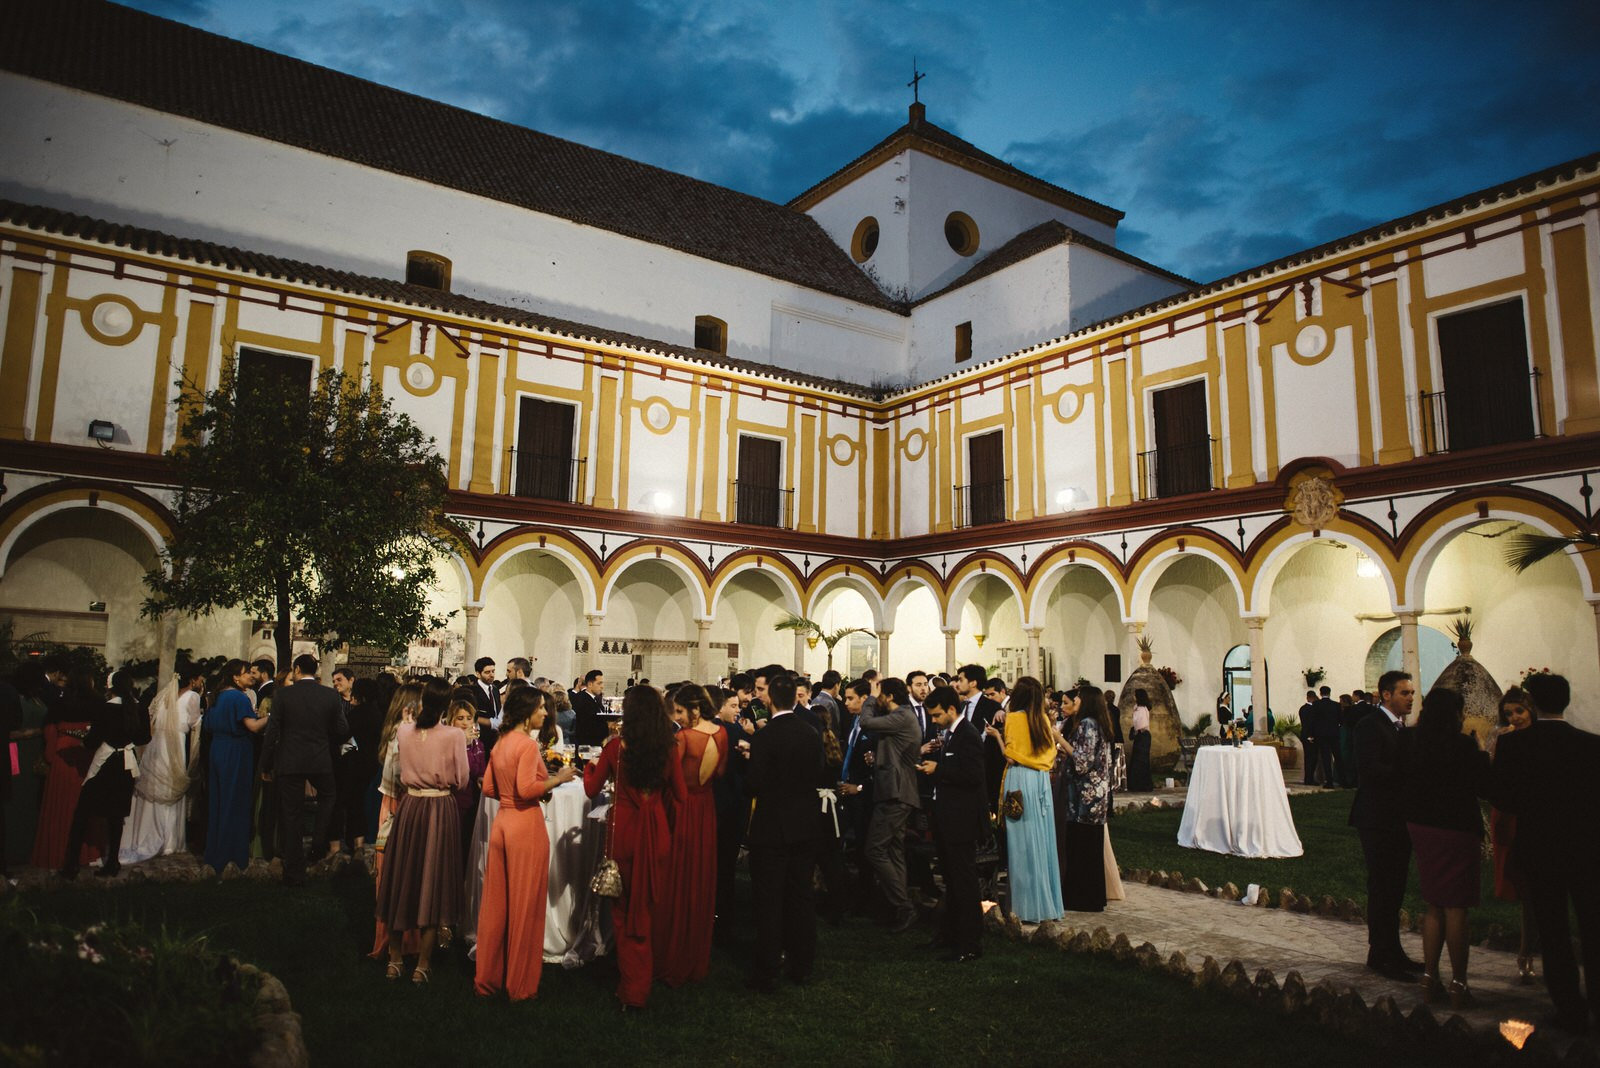 fotografo de bodas sevilla - fotografo boda - fotografía sevilla - Andrés AmarilloAAA_3360- fine.JPG